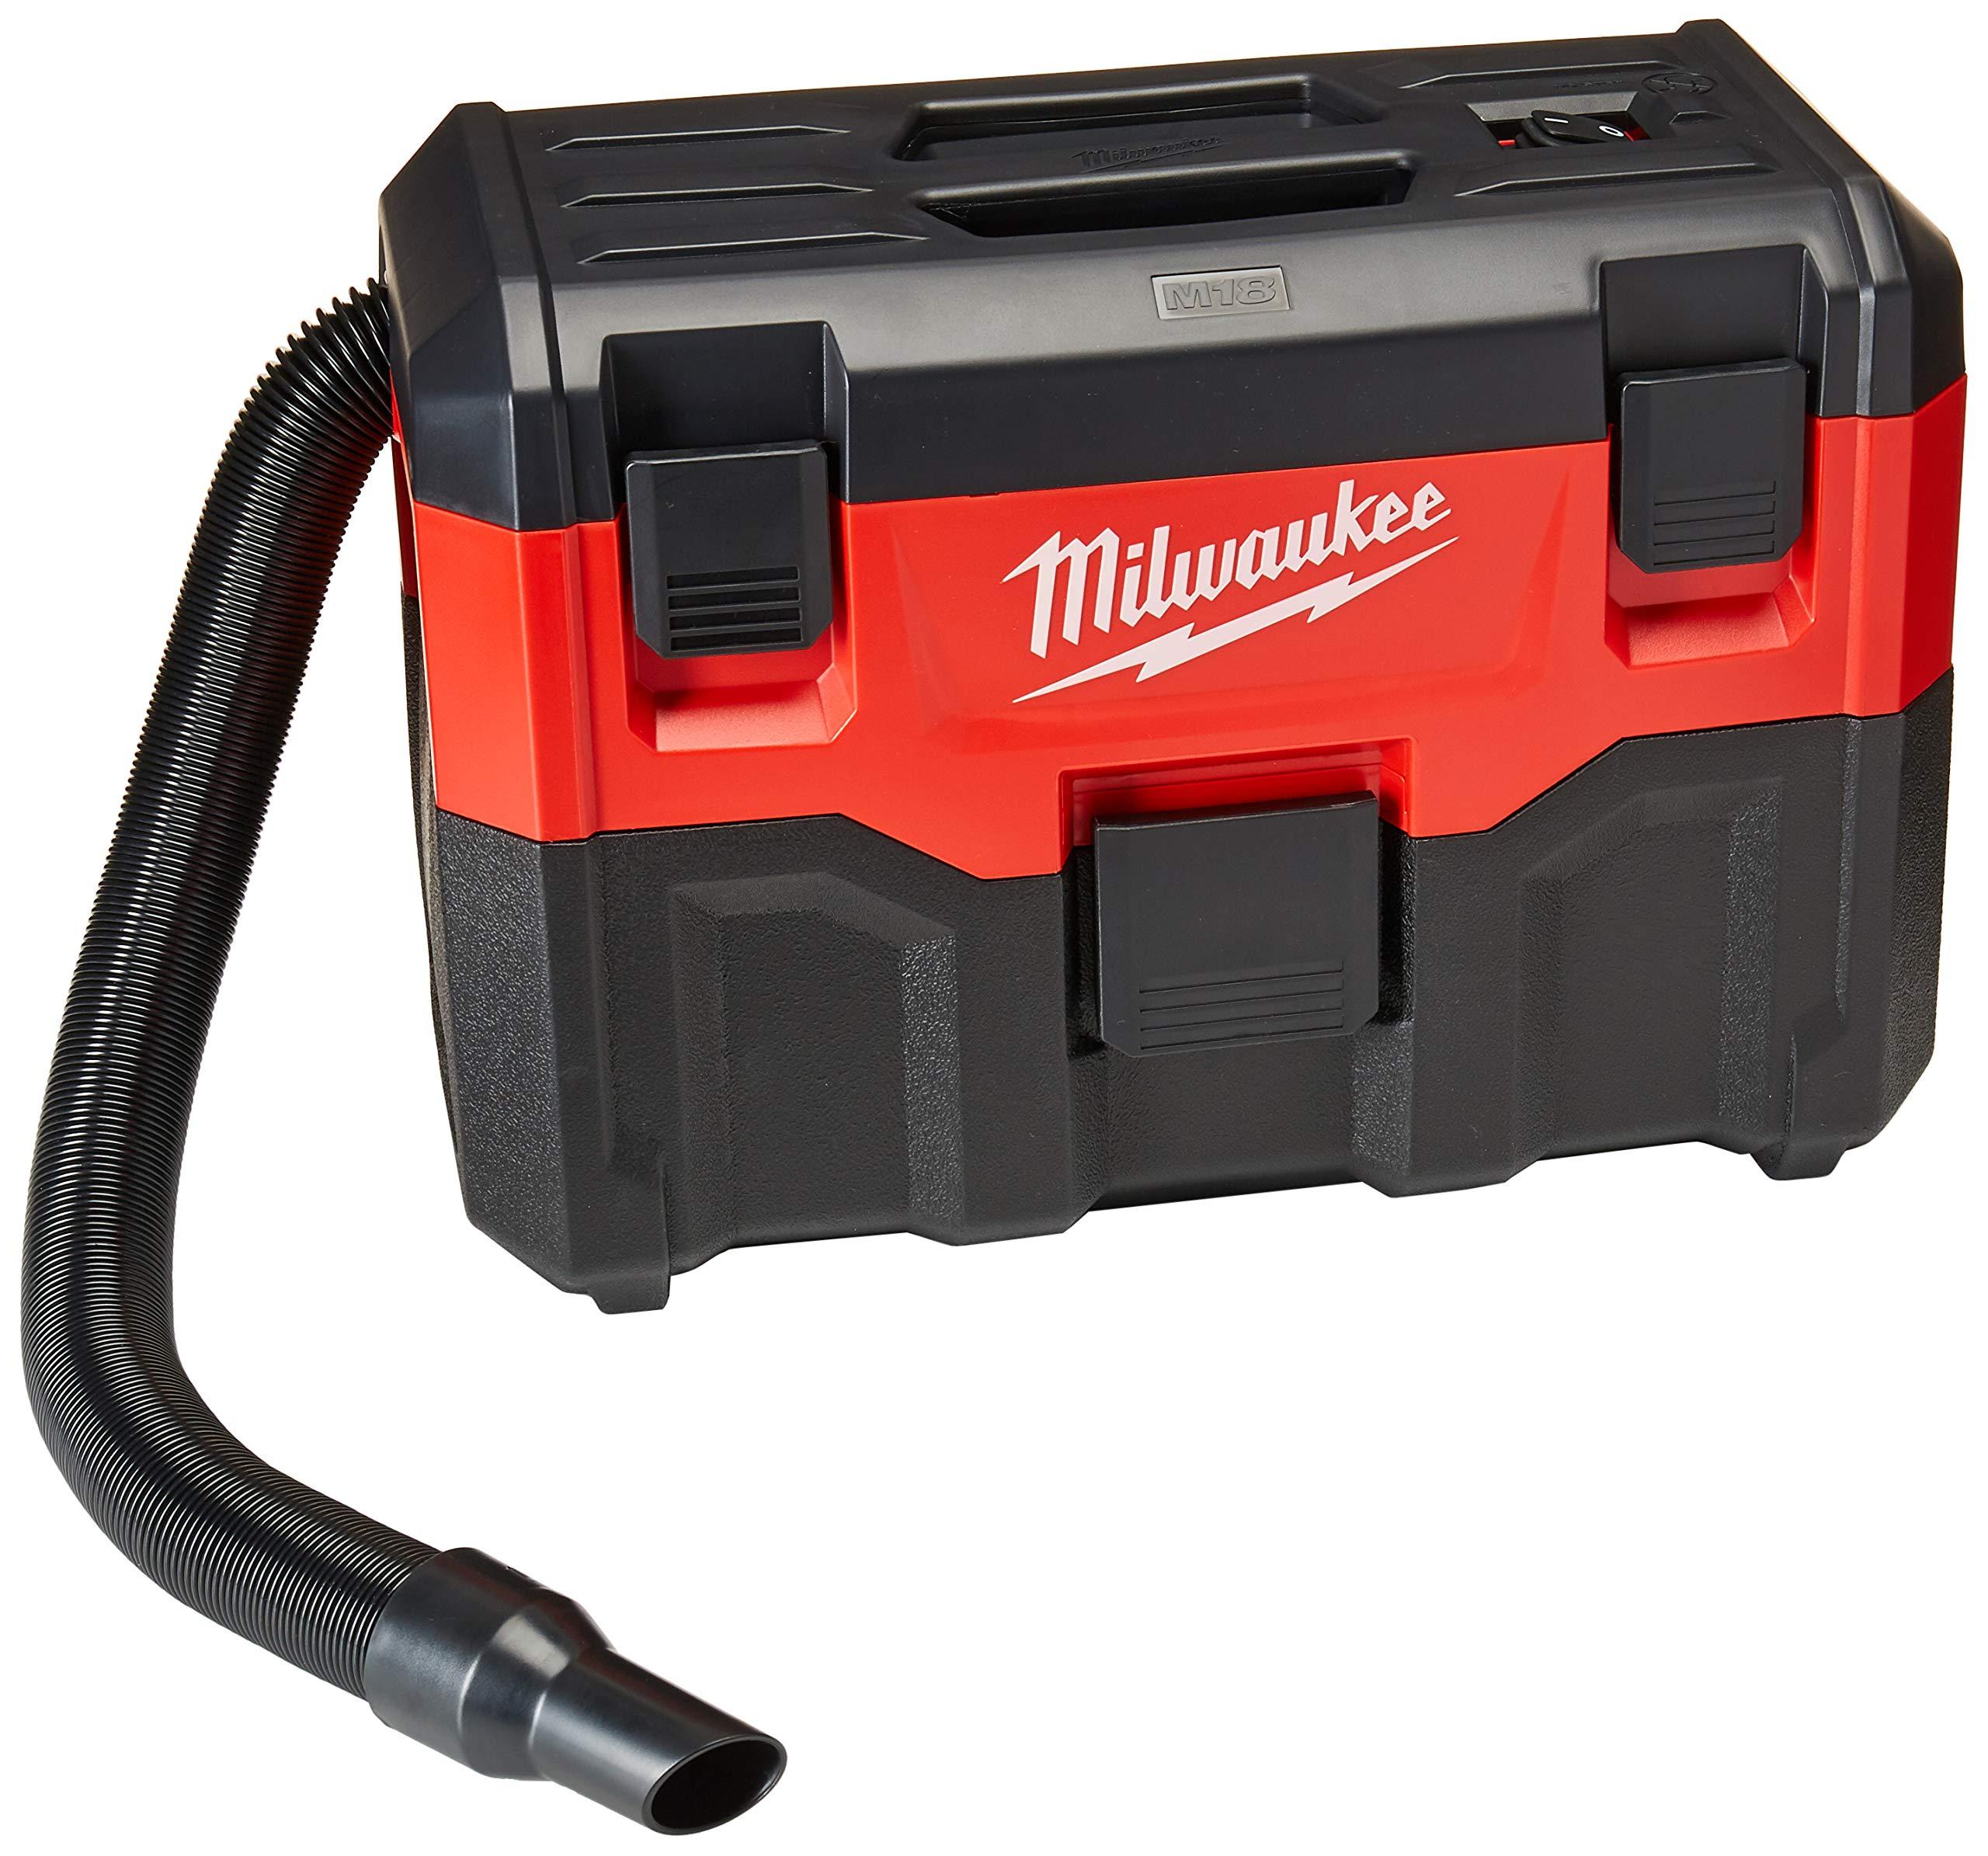 Milwaukee 0880-20 18-Volt Cordless Wet/Dry Vacuum by Milwaukee